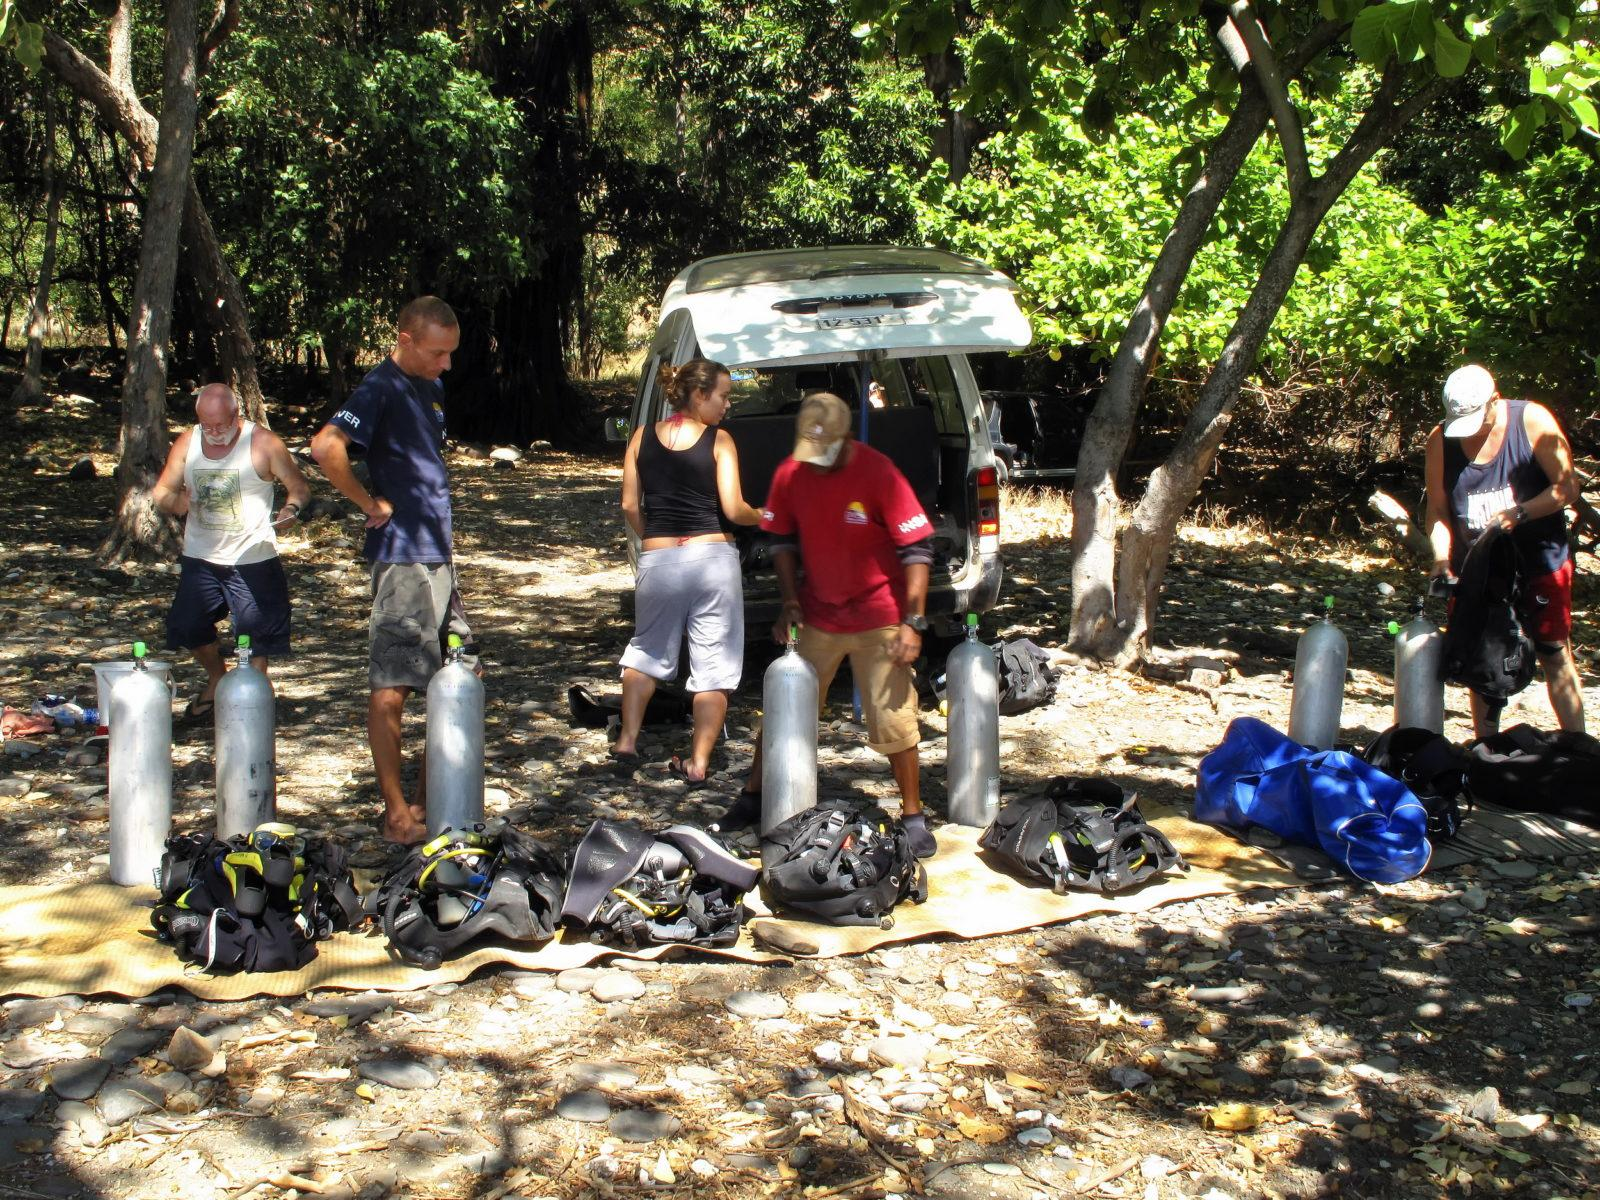 Kitting up East of Dili